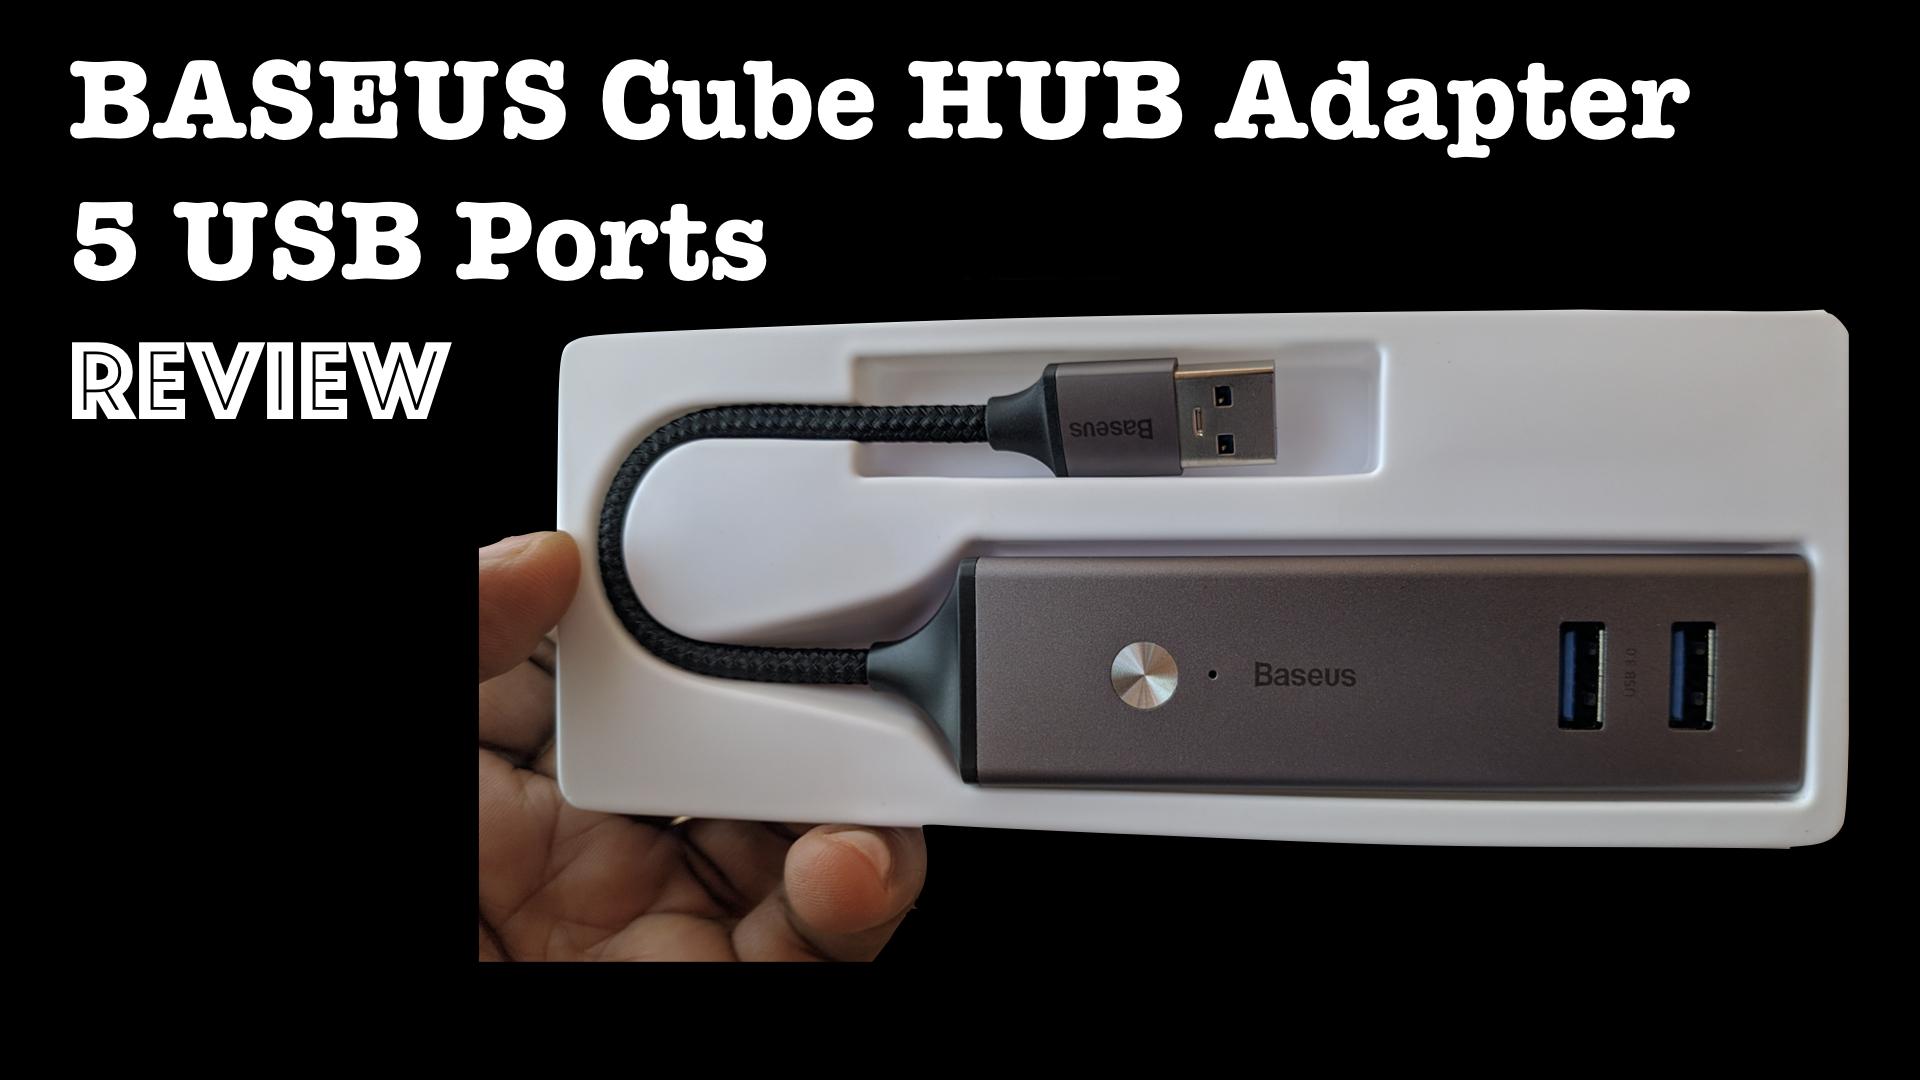 Baseus Cube HUB Adapter Review